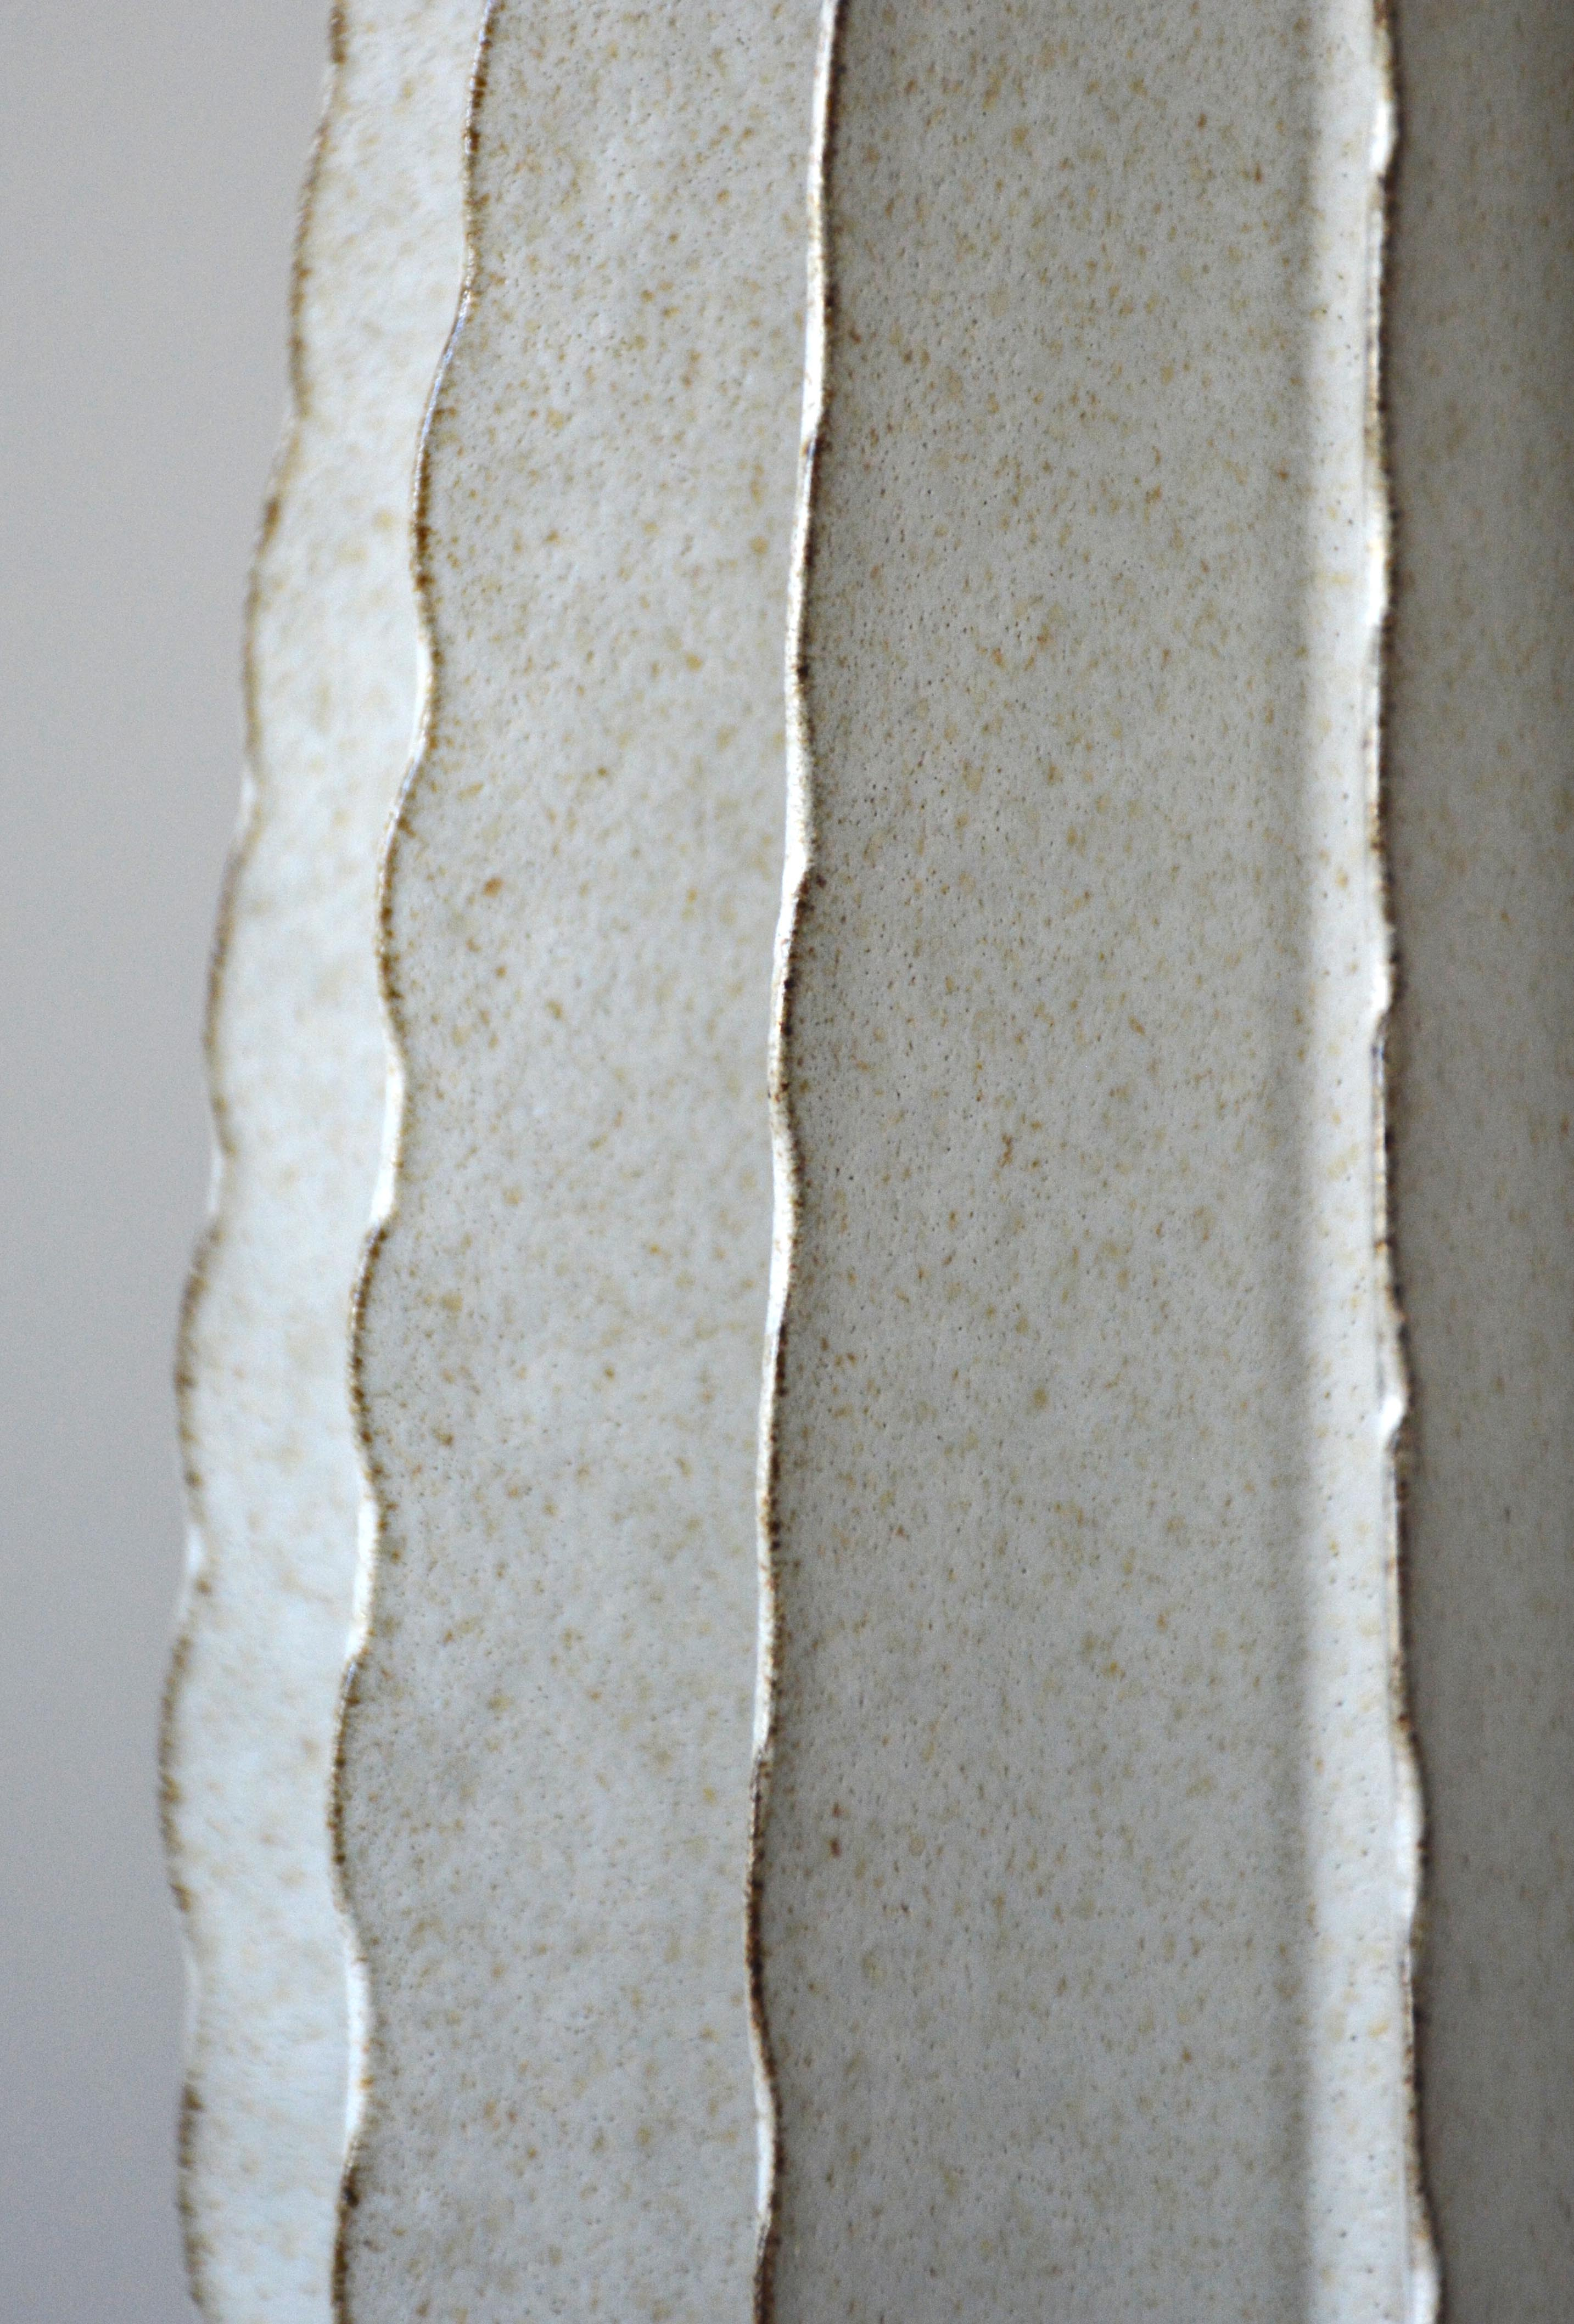 Teardrop Cone Detail (2775)